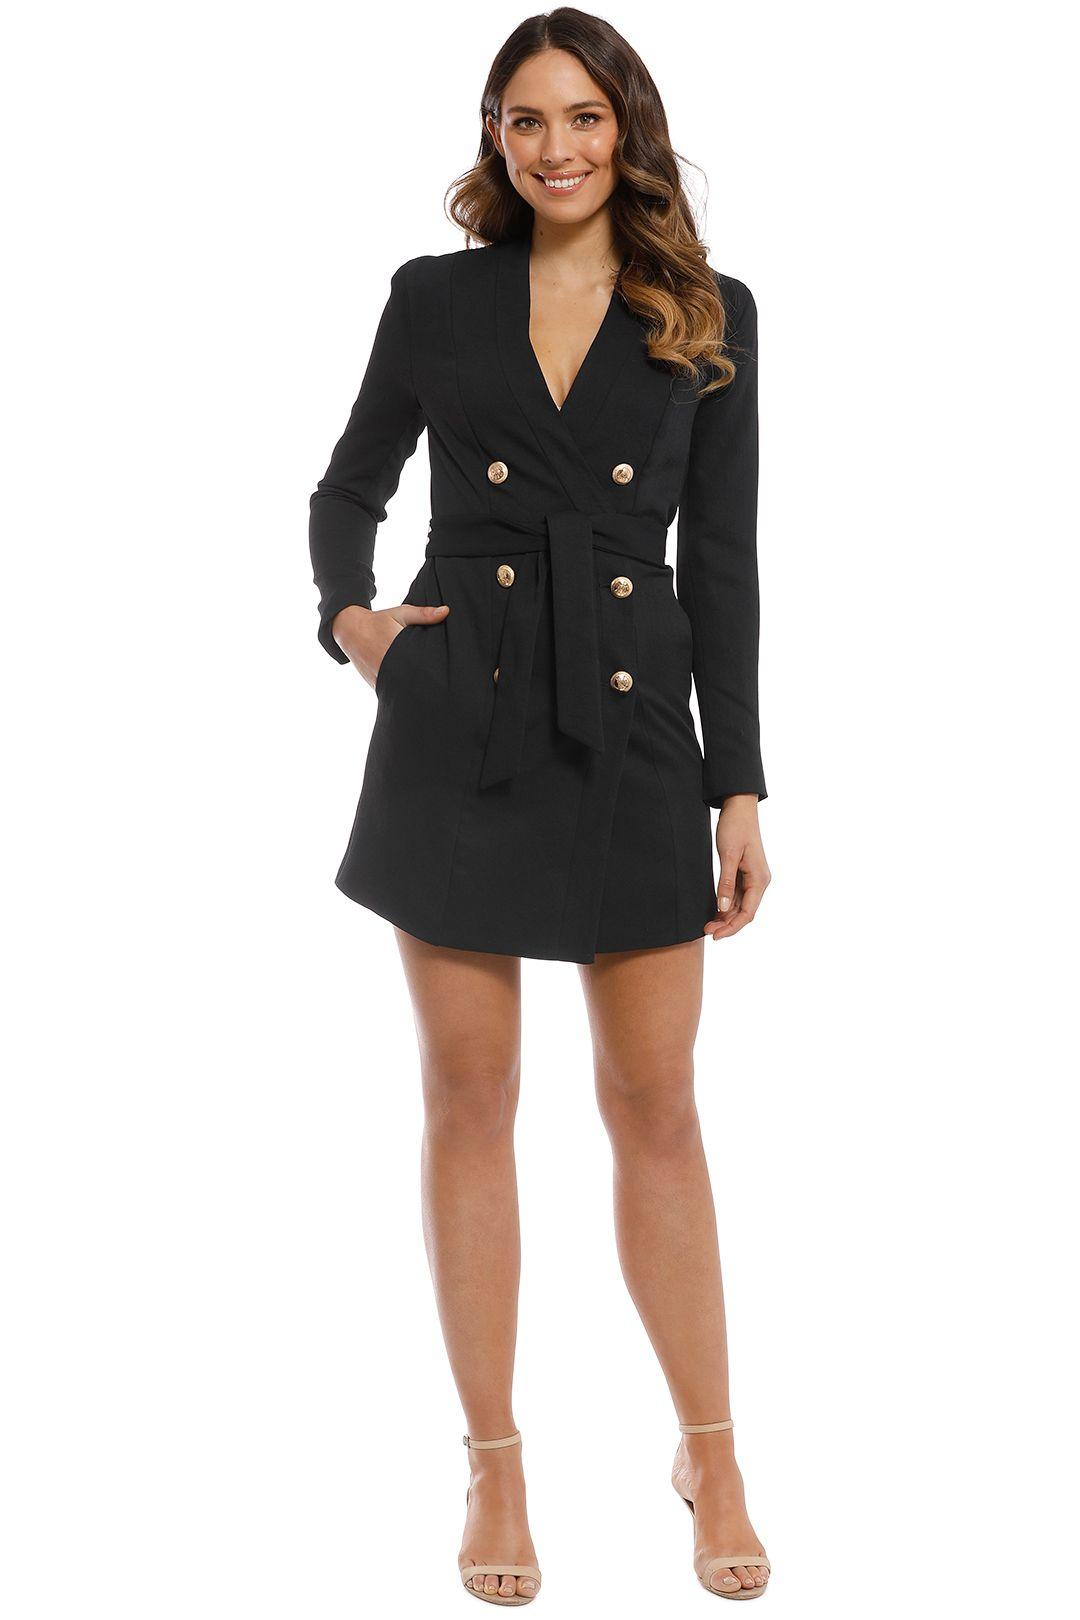 Kookai - Edwina Blazer Dress - Black - Front